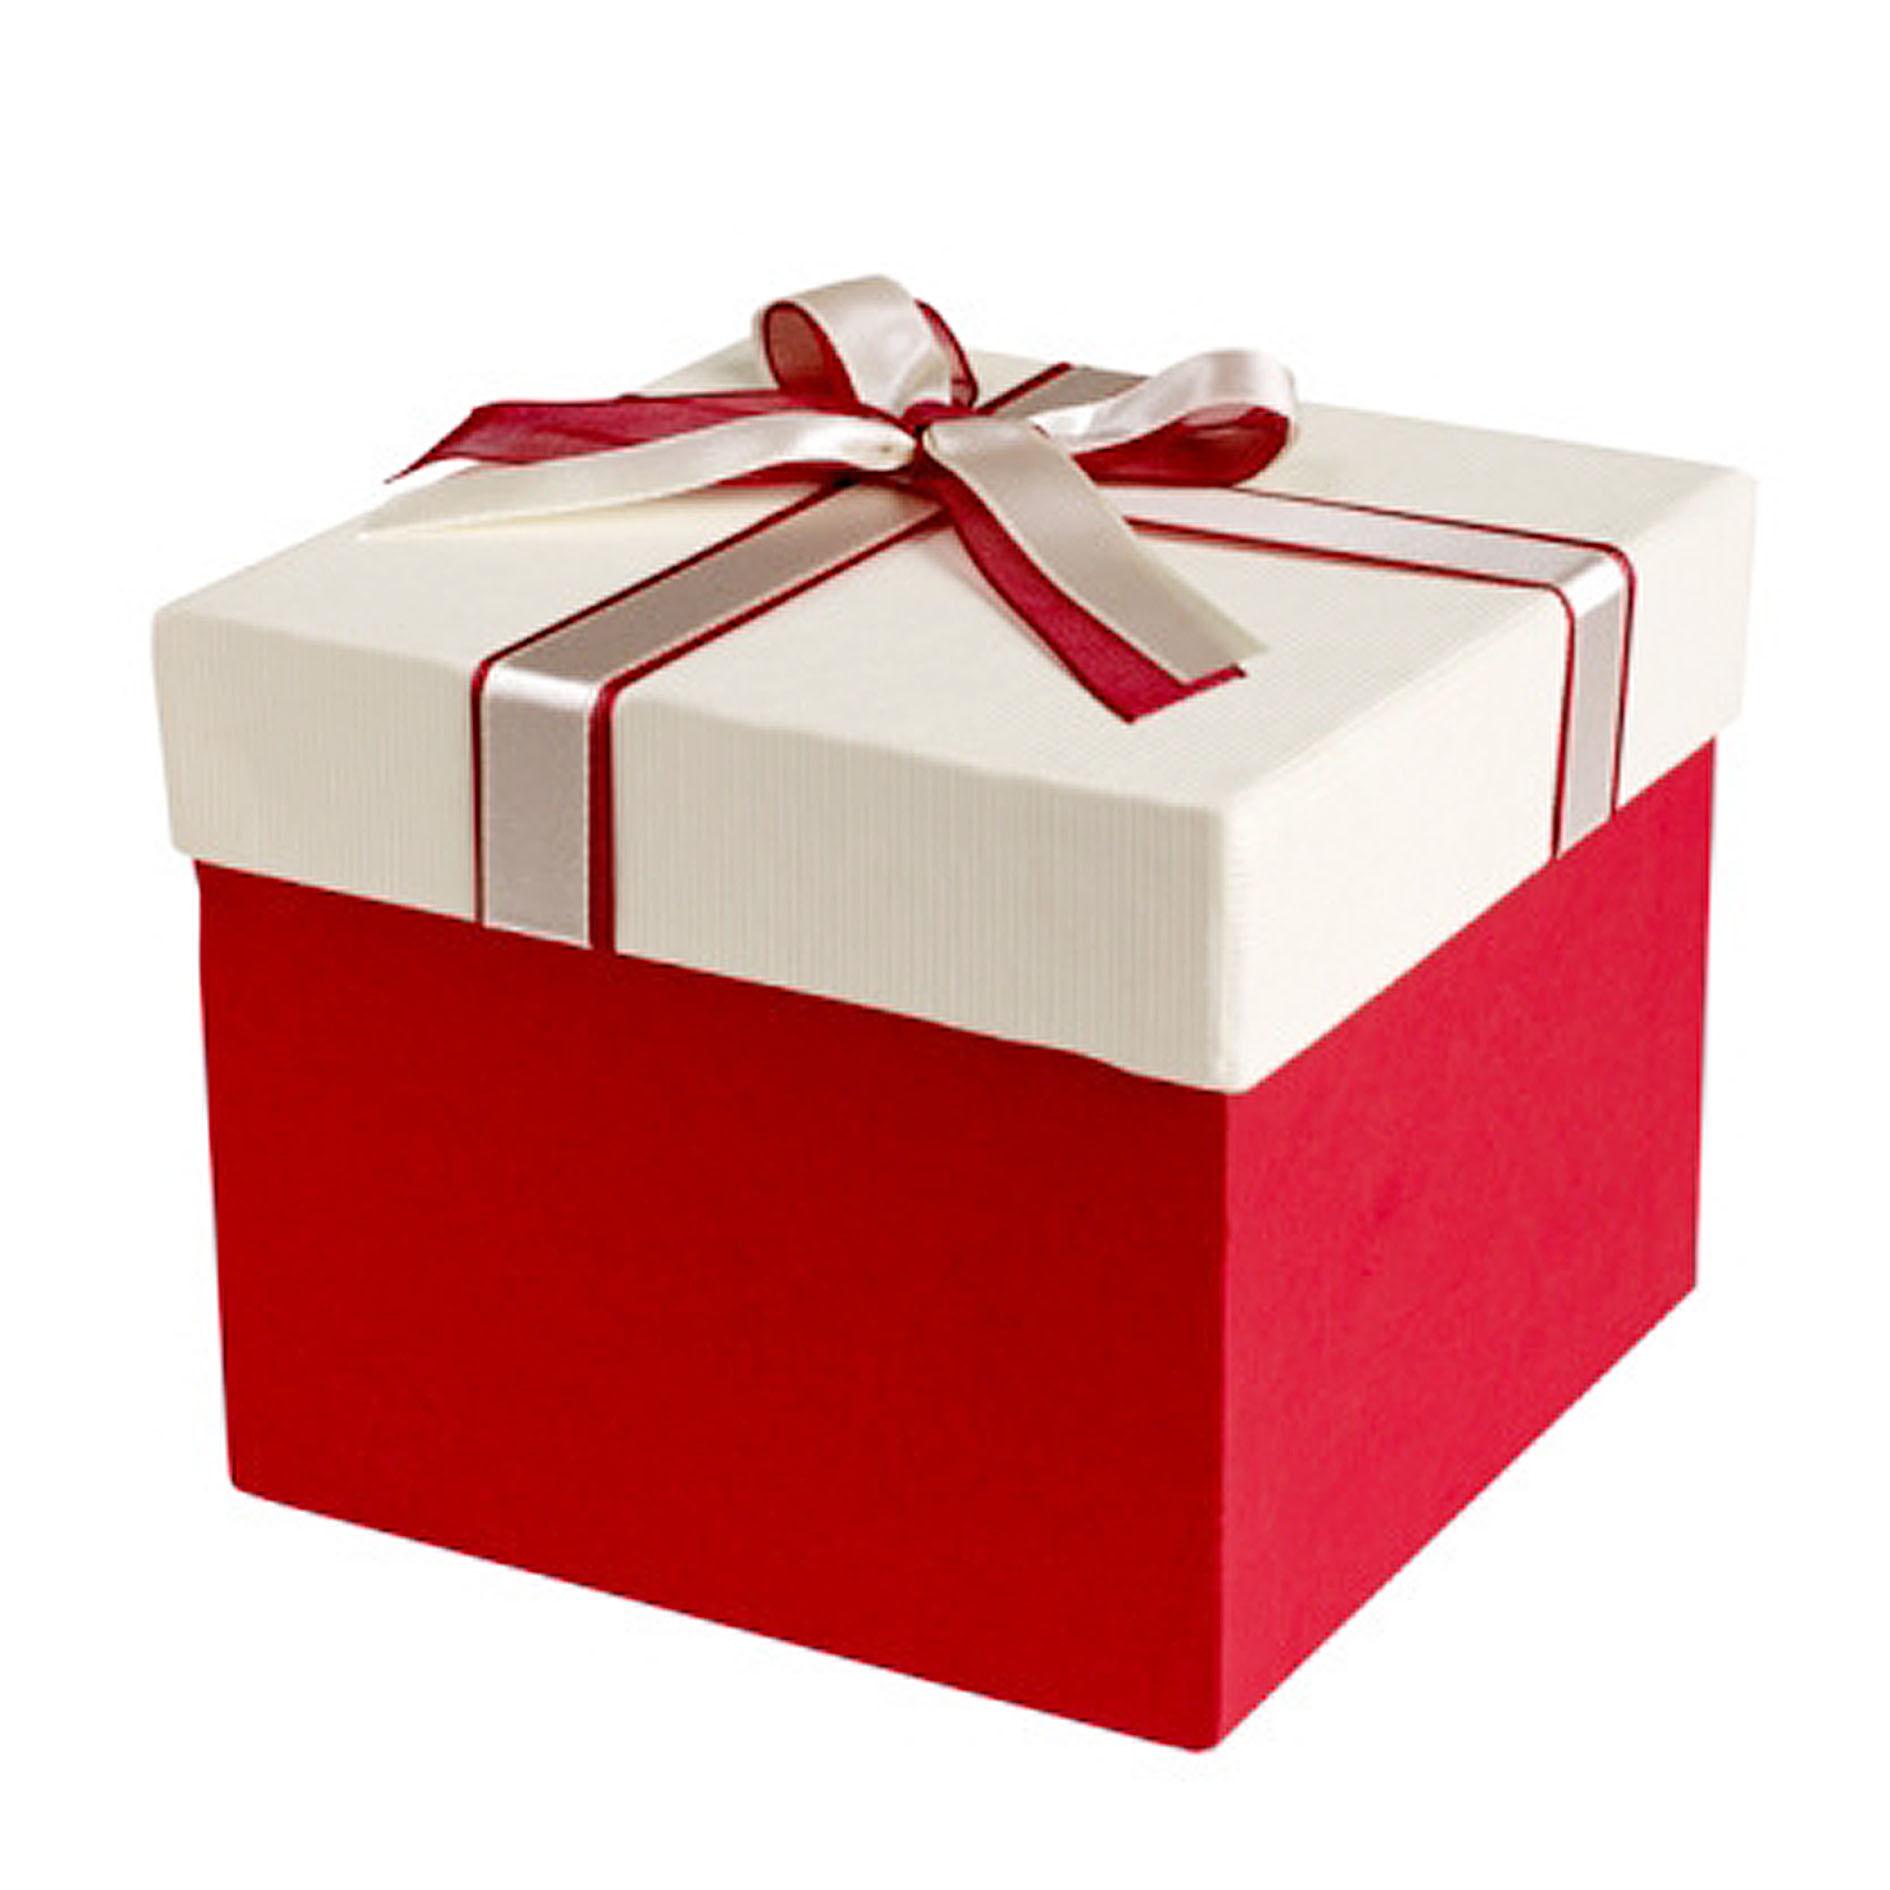 Decorative Boxes In Bulk : Decorative gift boxes wholesale